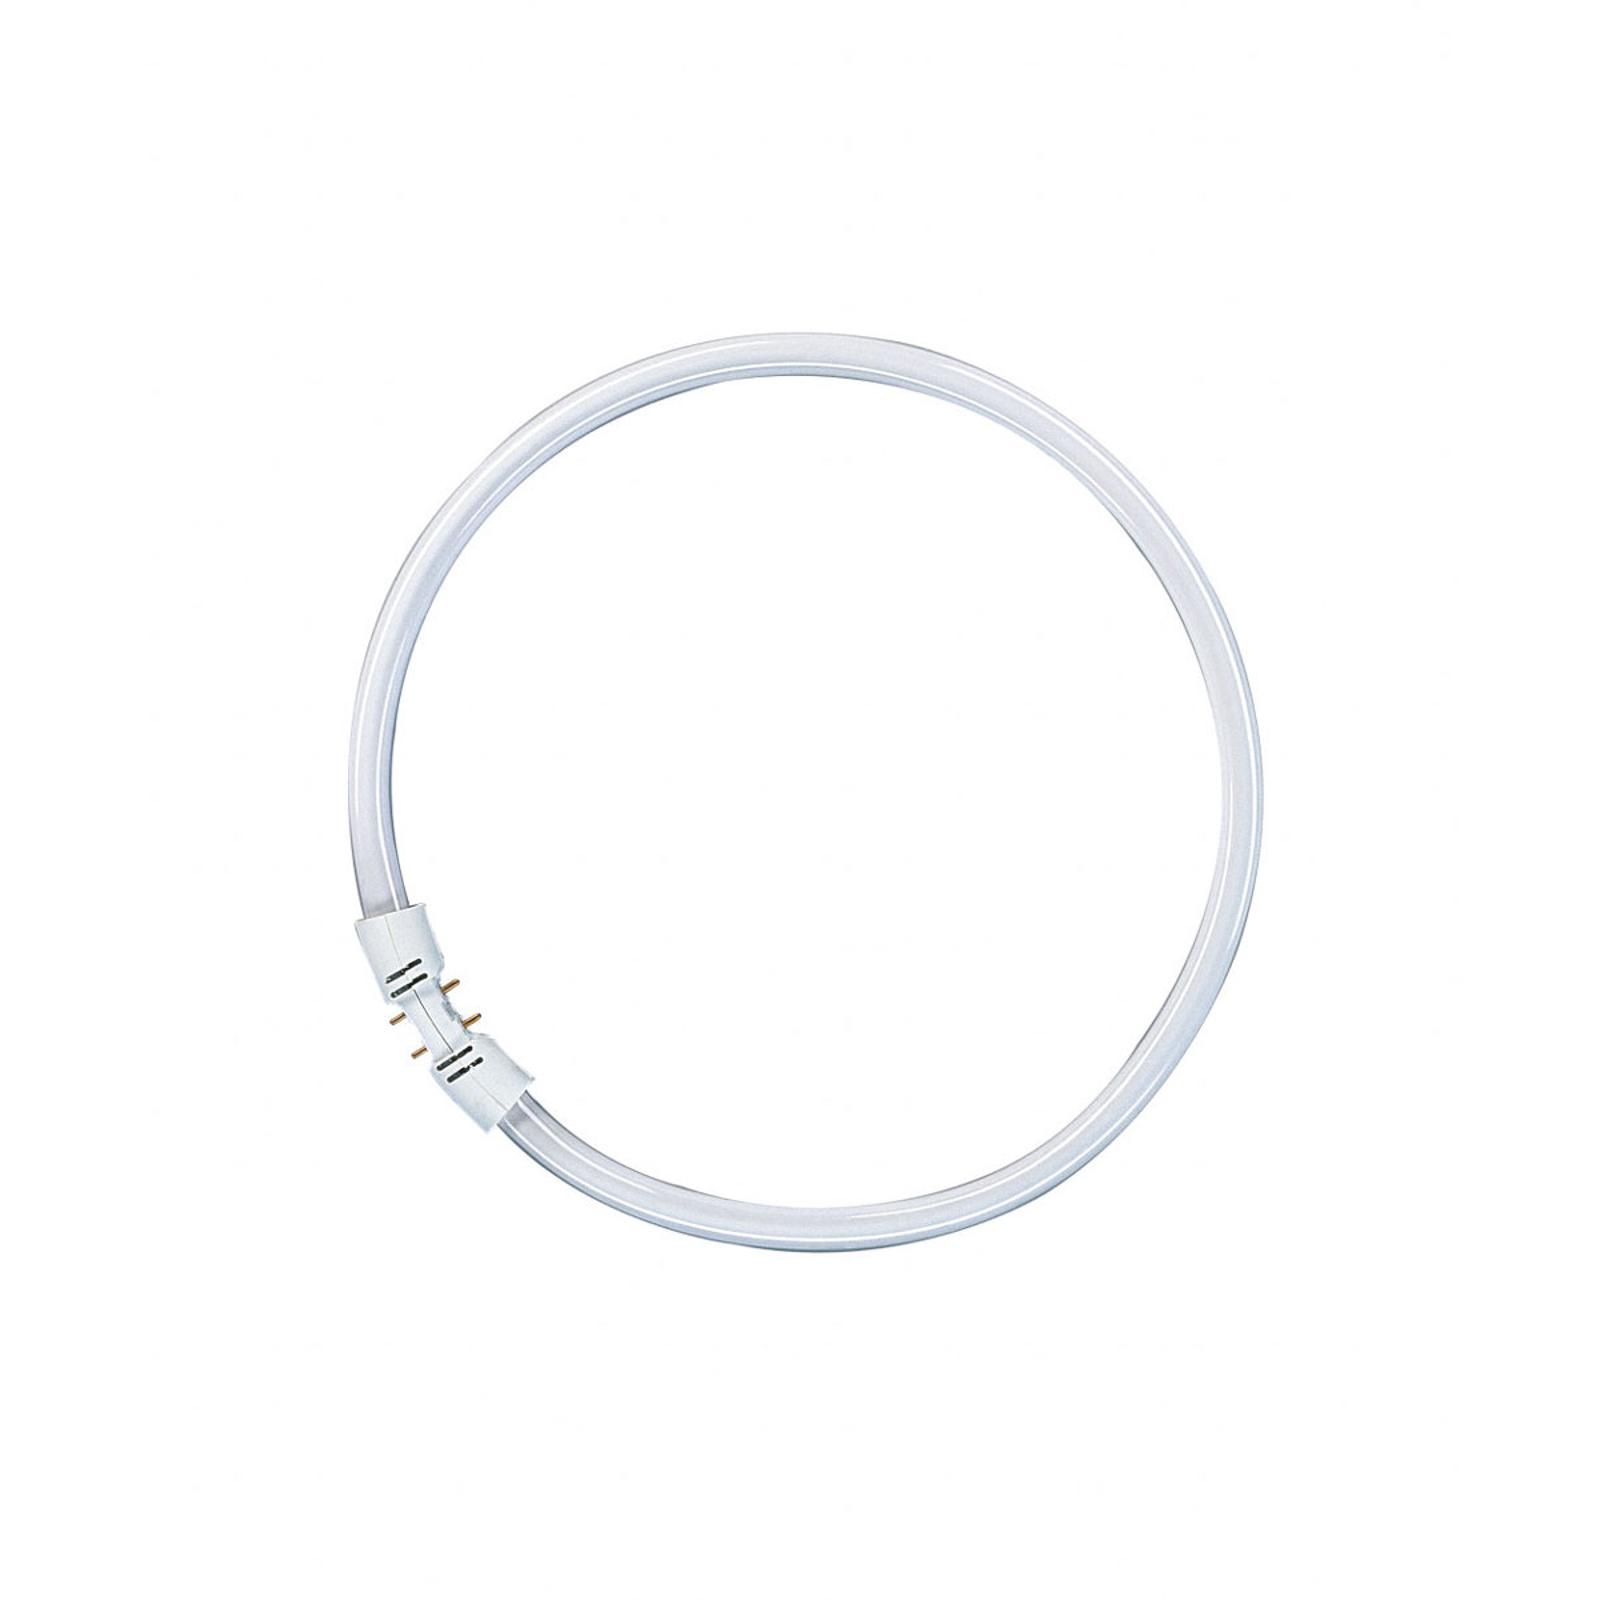 2Gx13 LUMILUX T5 Ring-lysstoffpære 55W 830